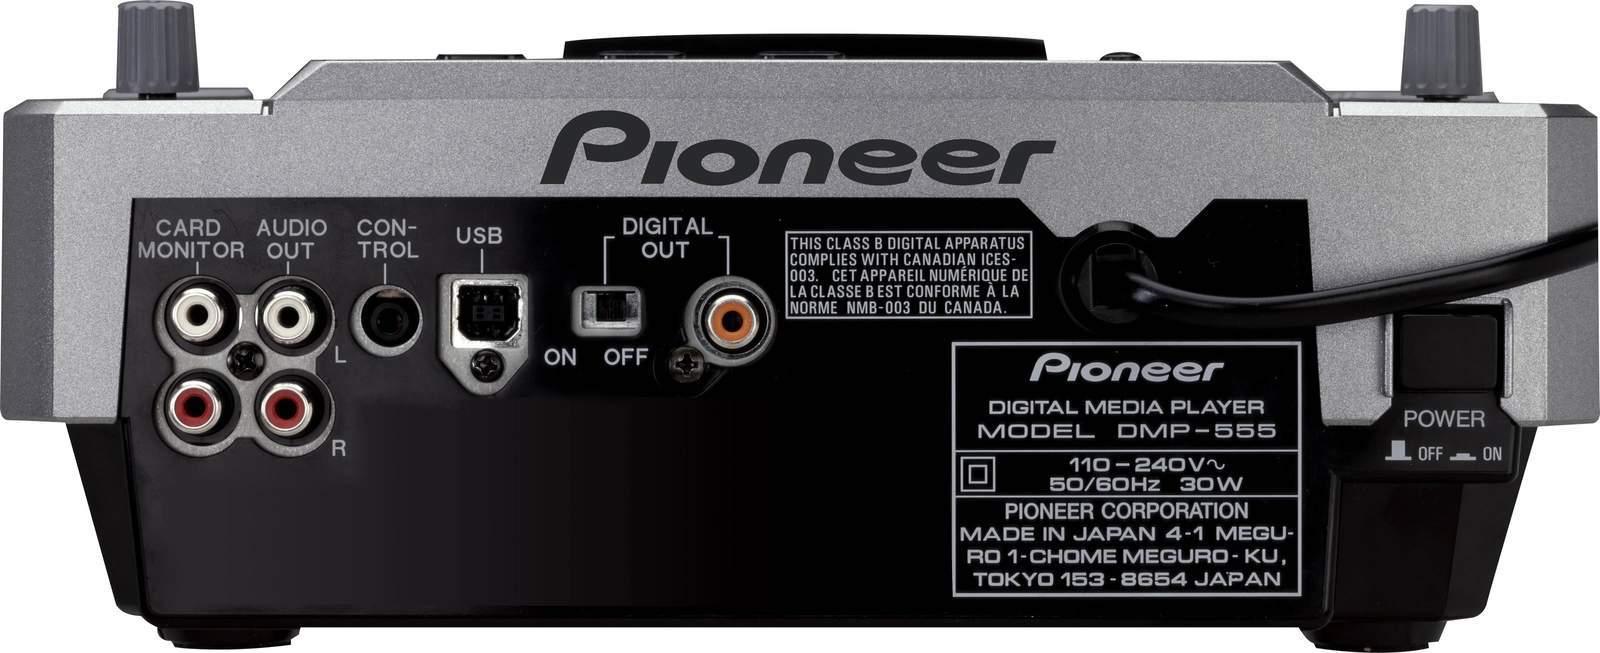 pioneer cdj 400 user manual